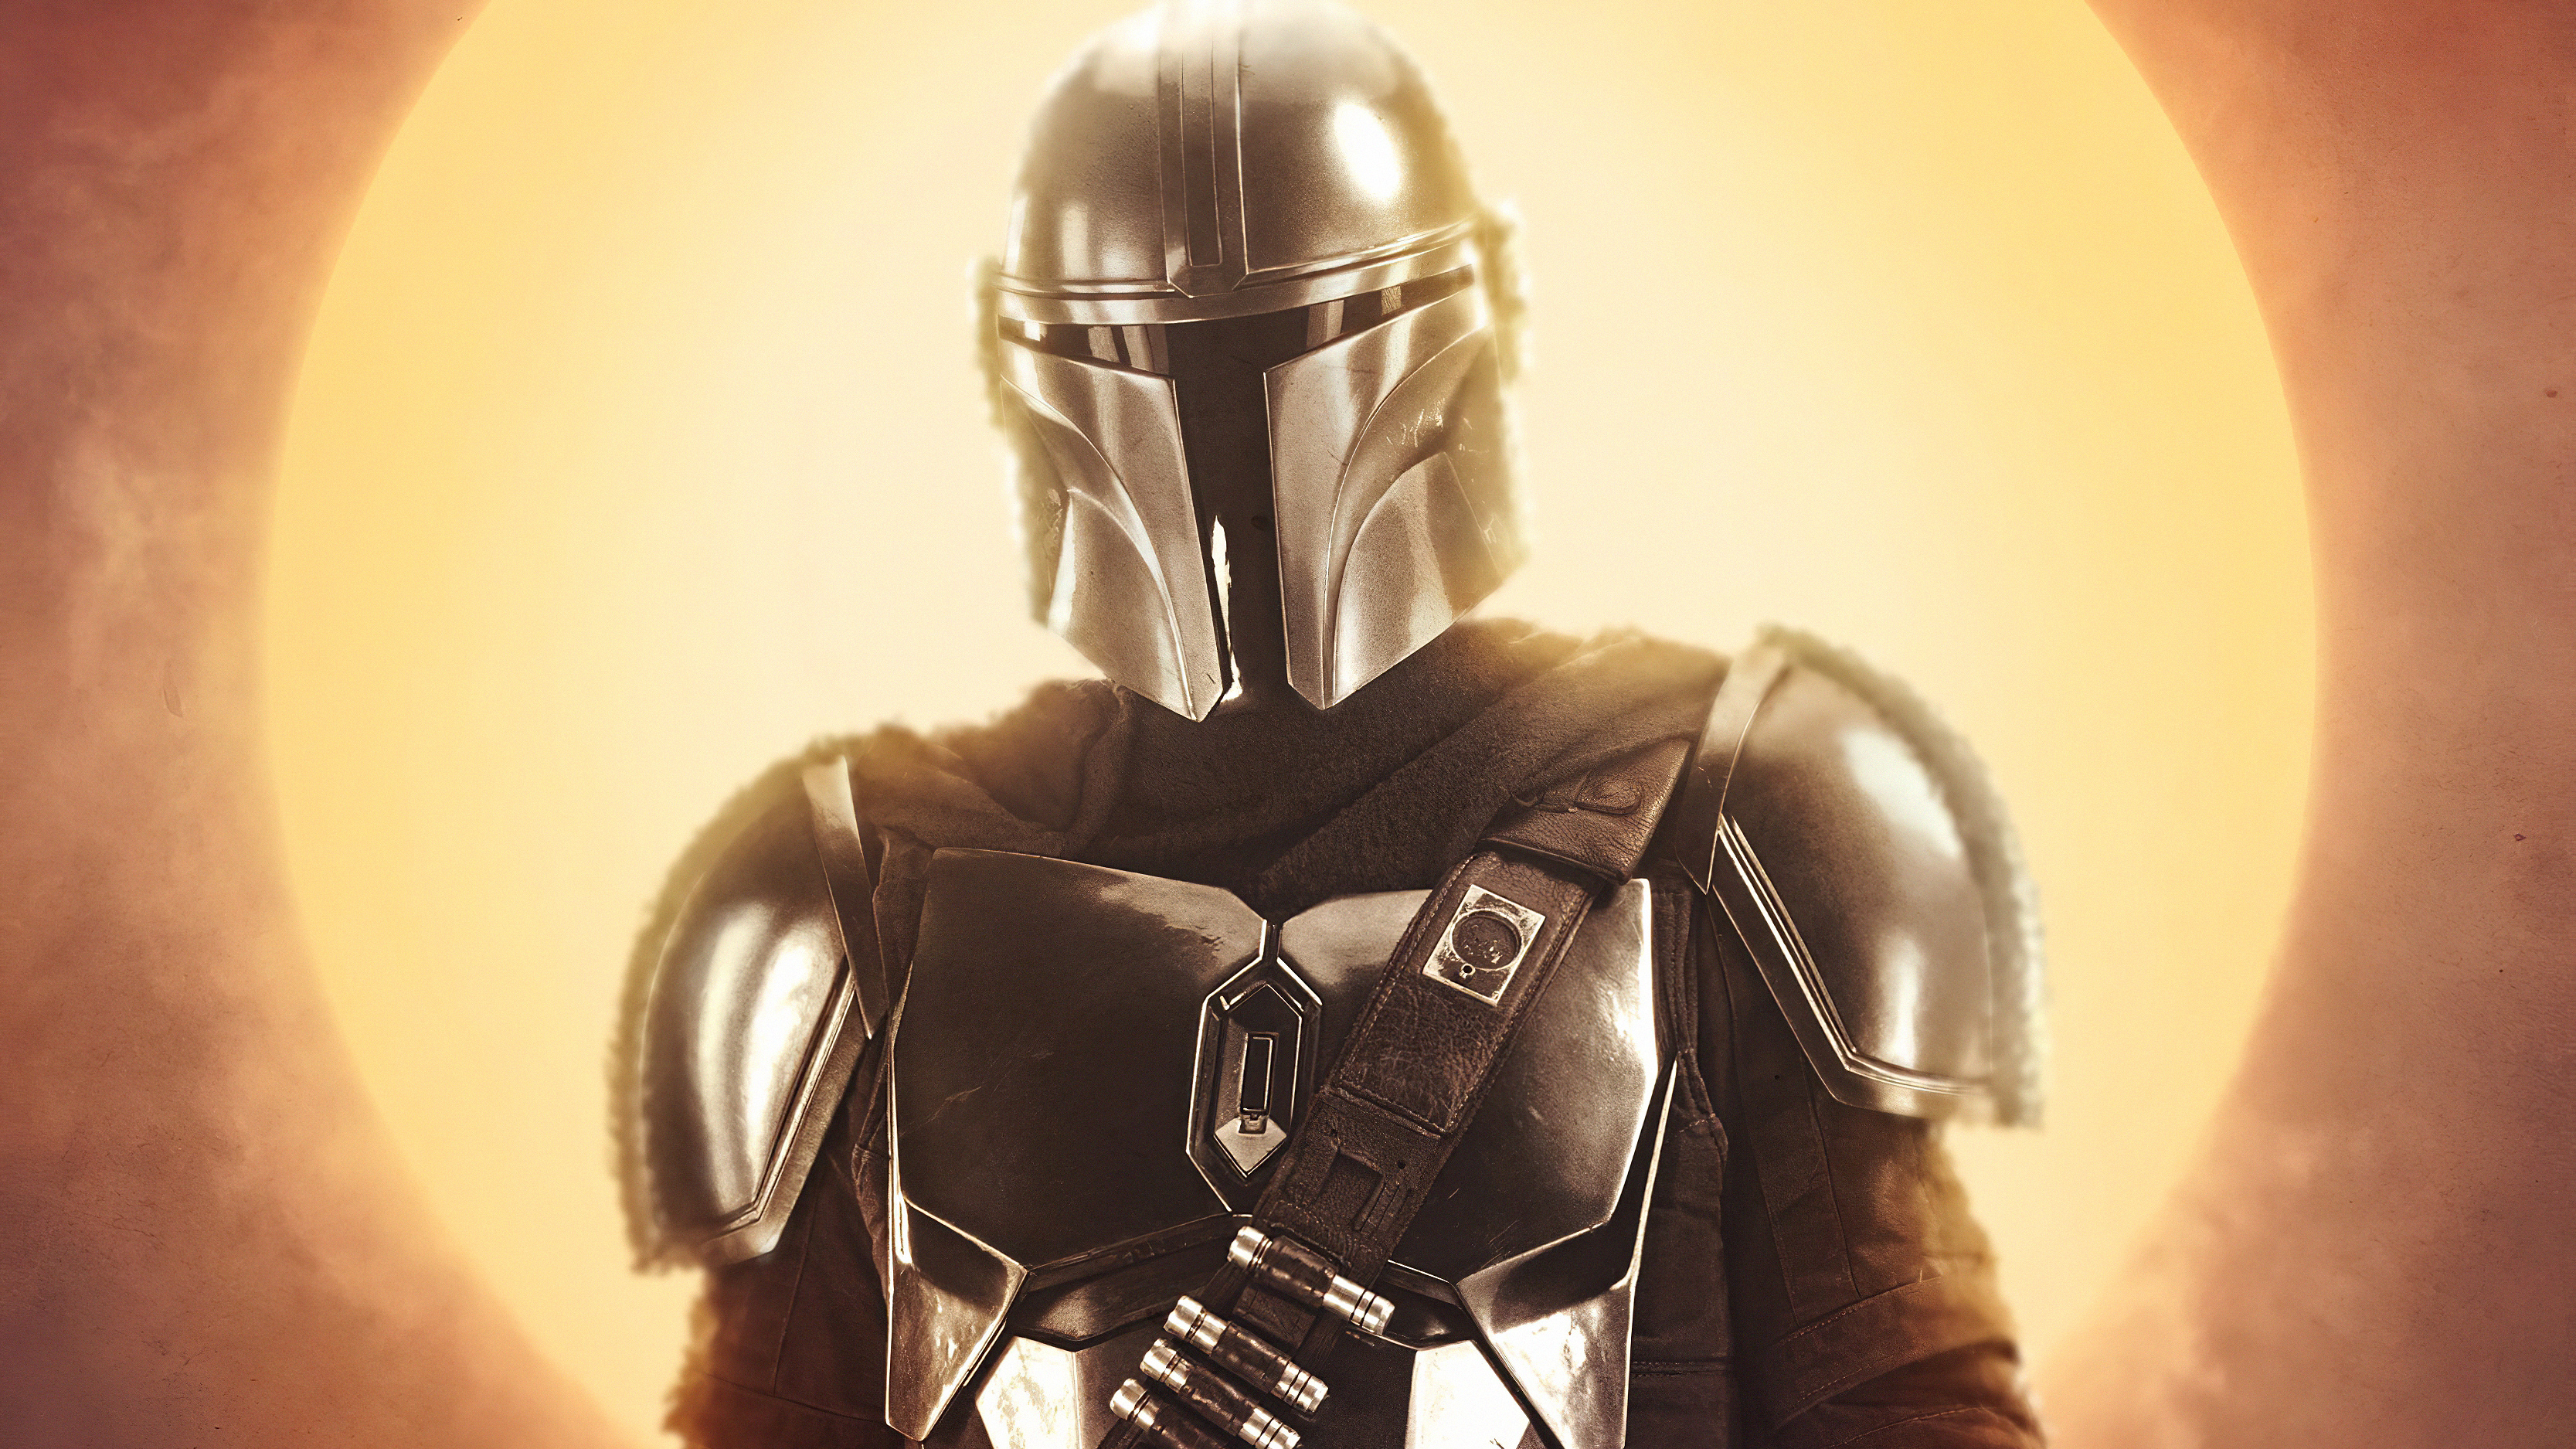 People 3334x1875 The Mandalorian Star Wars TV Series bounty hunter science fiction helmet